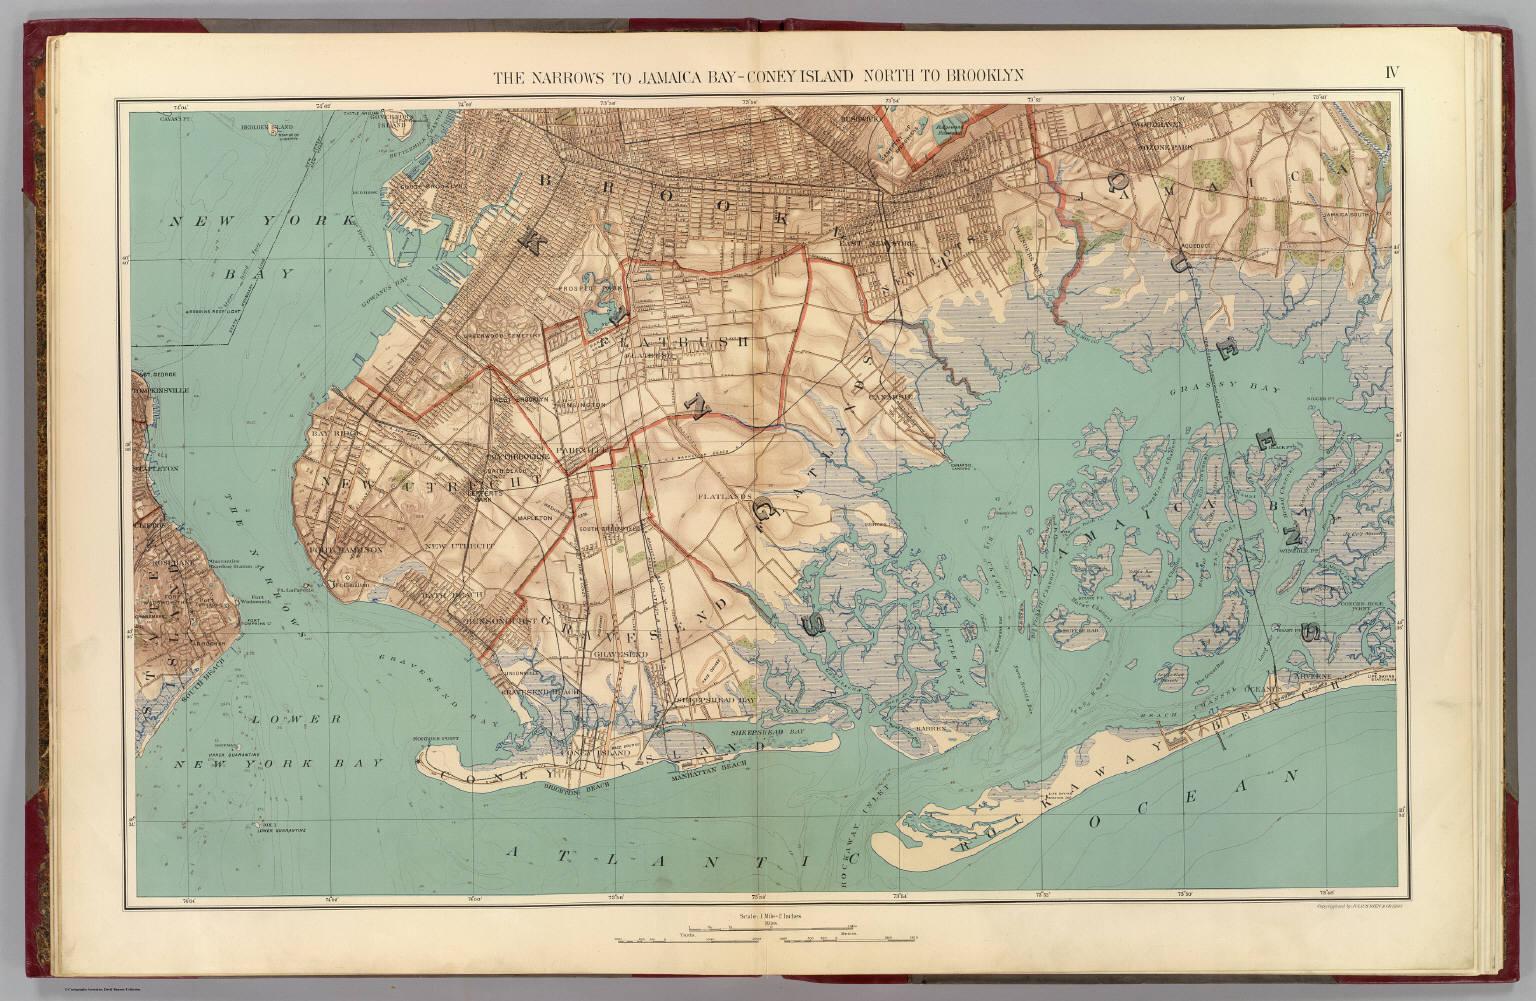 Narrows Jamaica Bay Brooklyn David Rumsey Historical Map Collection